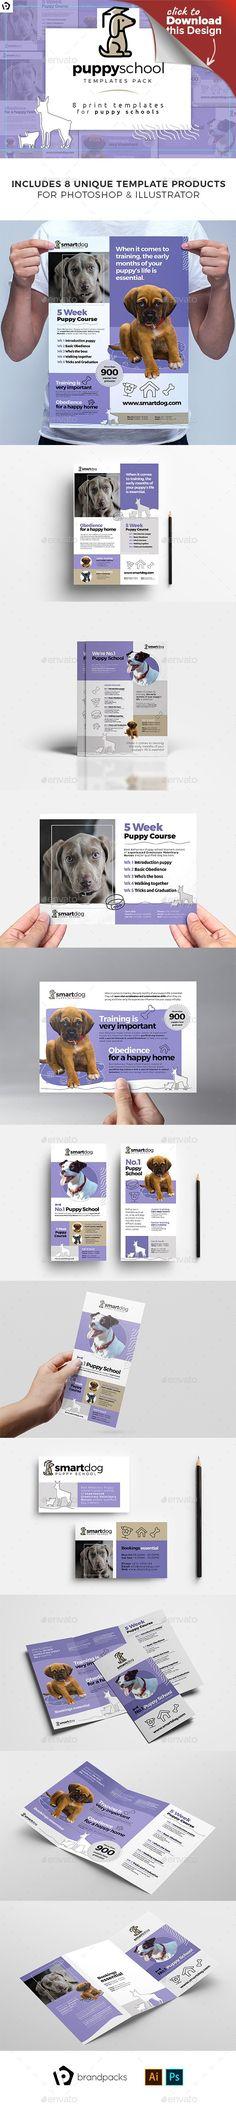 ai, BrandPacks, business card, Dog trainer, dog training, dog walker, dog walking, flyer, flyer design, flyer template, illustrator, leaflet, pamphlet, pet school, pet trainer, pet training, photoshop, poster, poster template, psd, puppy school, puppy school template, tri fold brochure, trifold brochure, vector, vet, vet clinic, vets Puppy School Templates Bundle for Adobe Photoshop & Adobe Illustrator   Create professional print advertisements, posters & flyers for puppy schools, ...